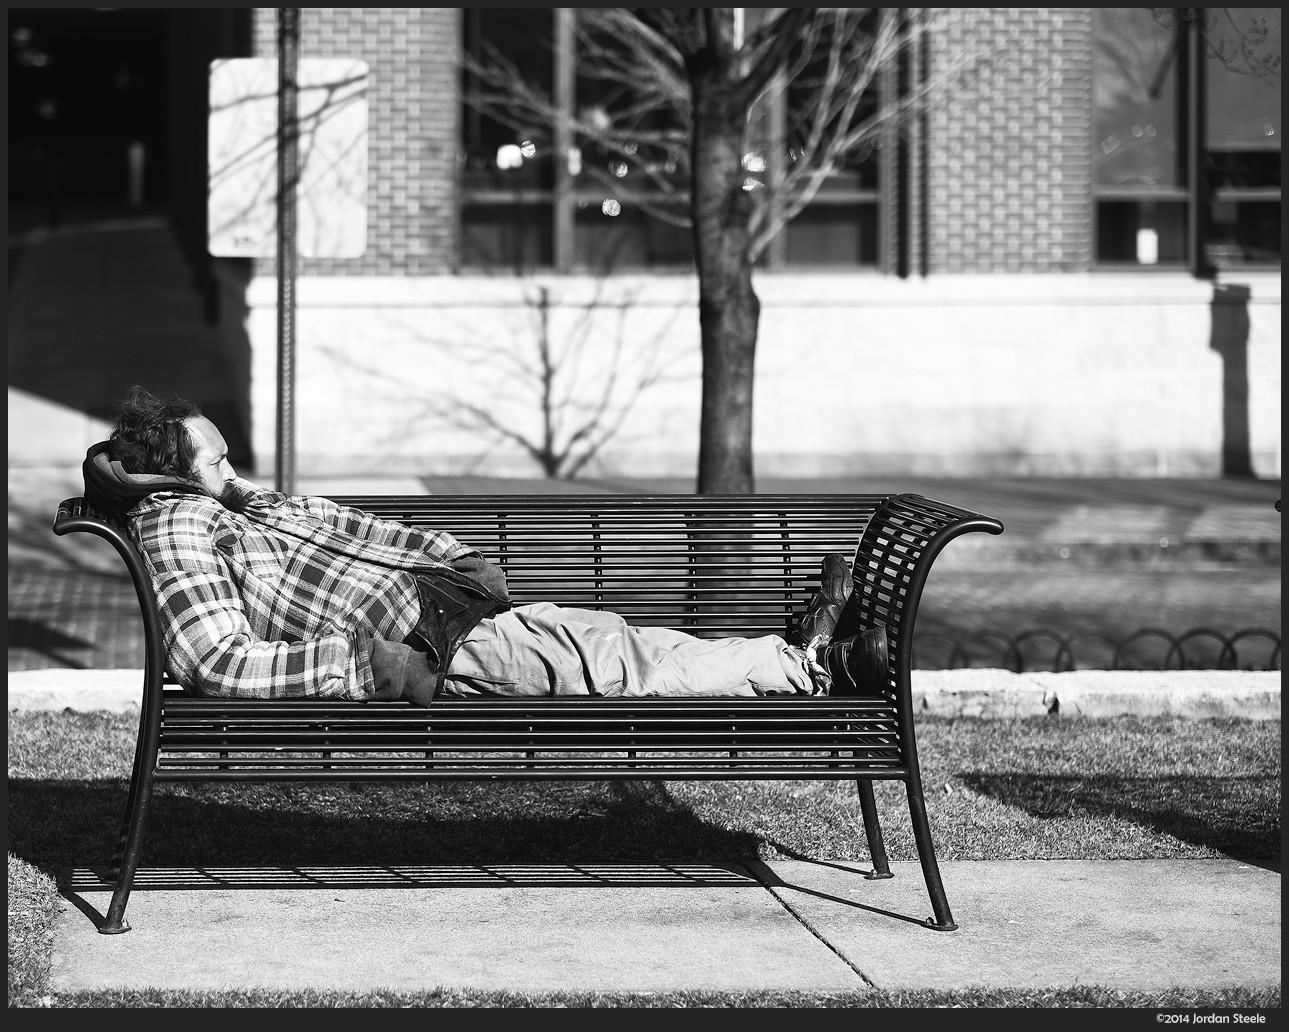 homeless_asleep1.jpg